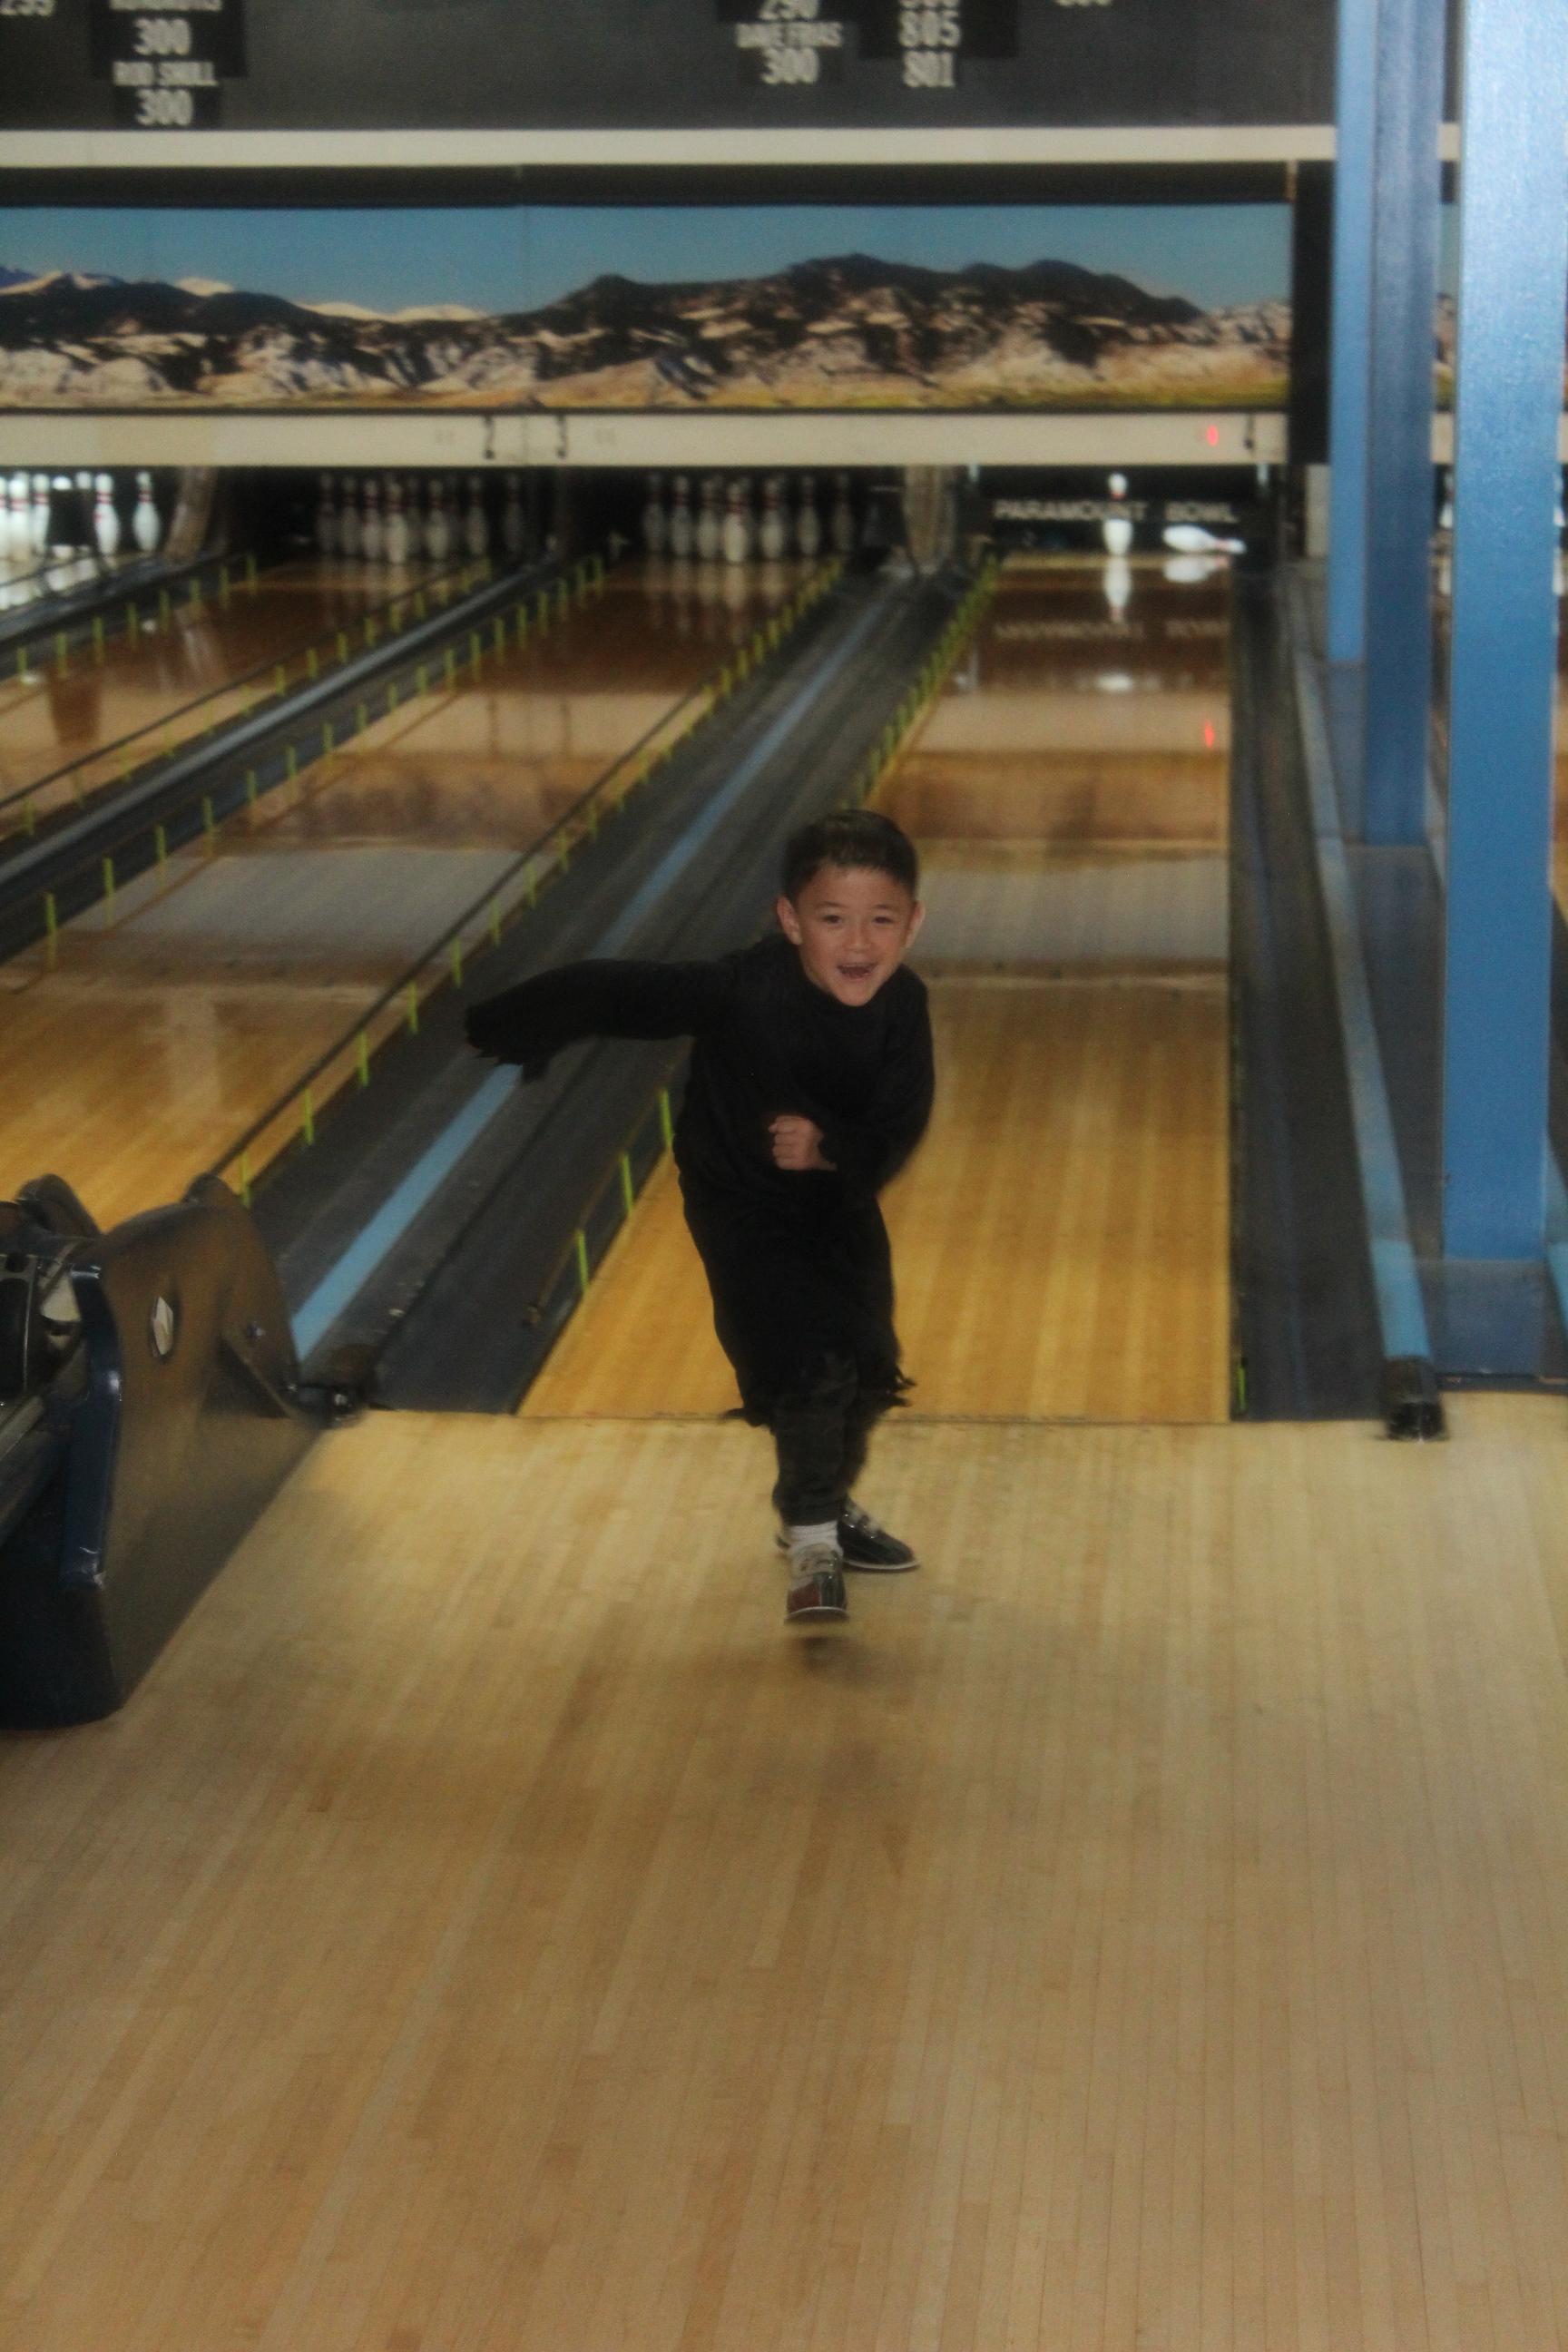 Bowling-2016 - IMG_4160